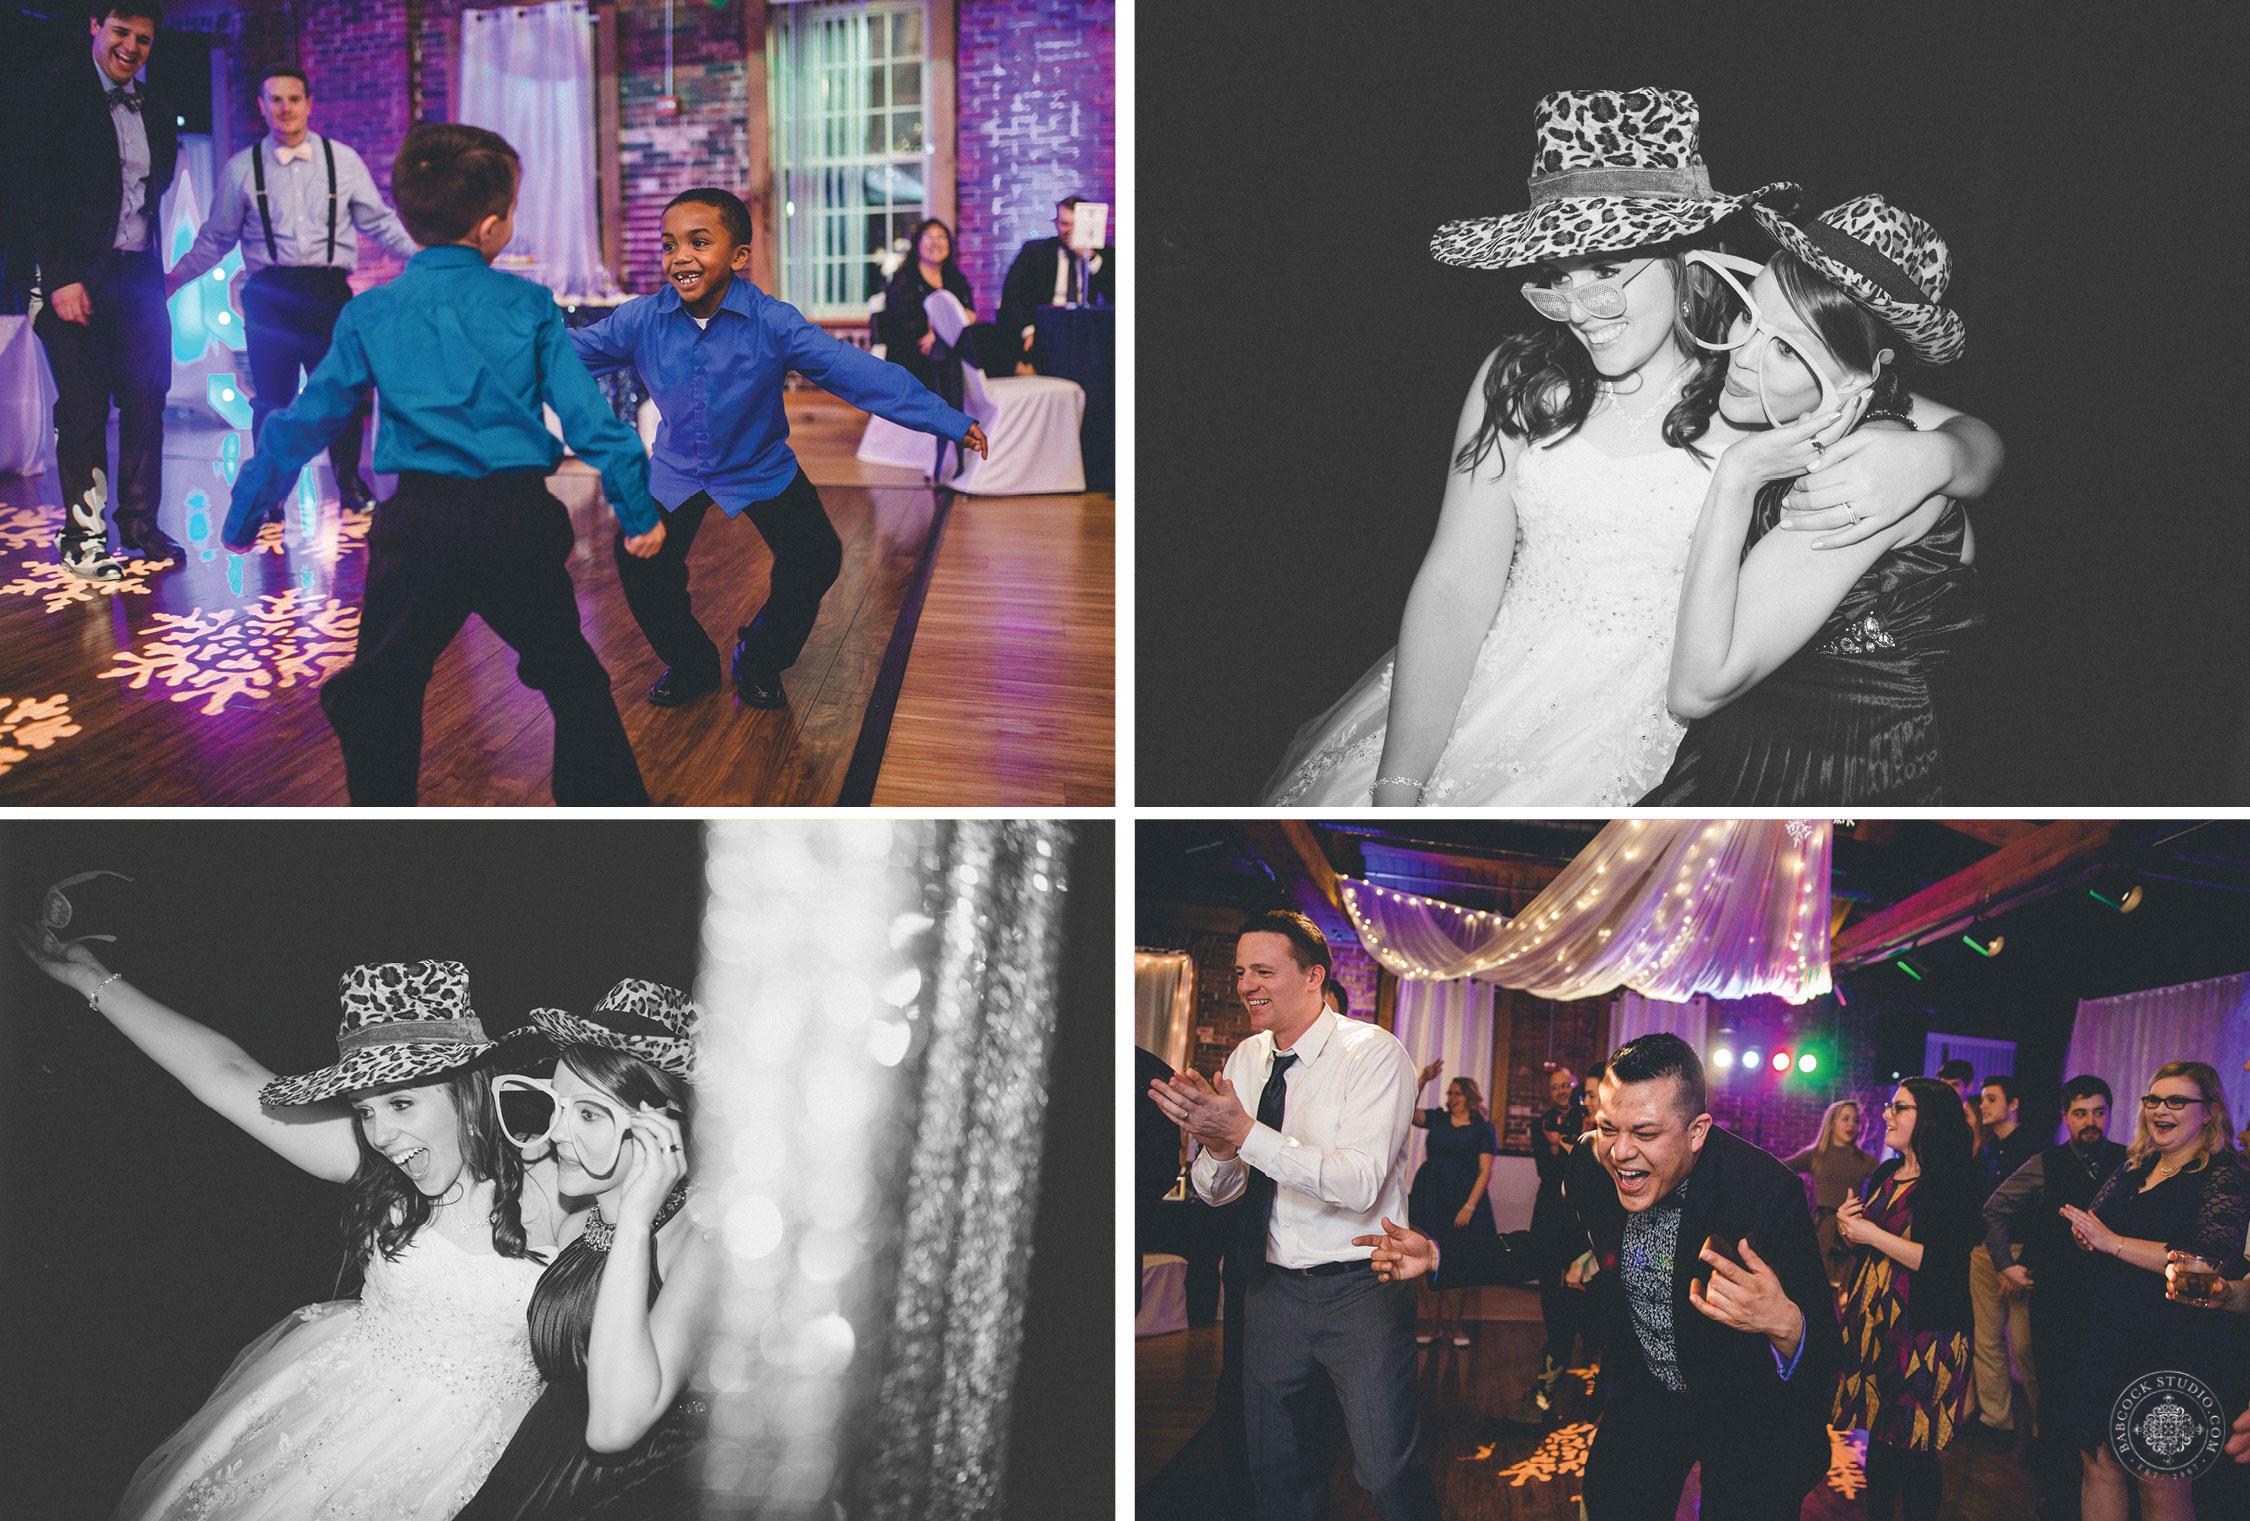 erica-nick-wedding-photographer-dayton-ohio-22.jpg